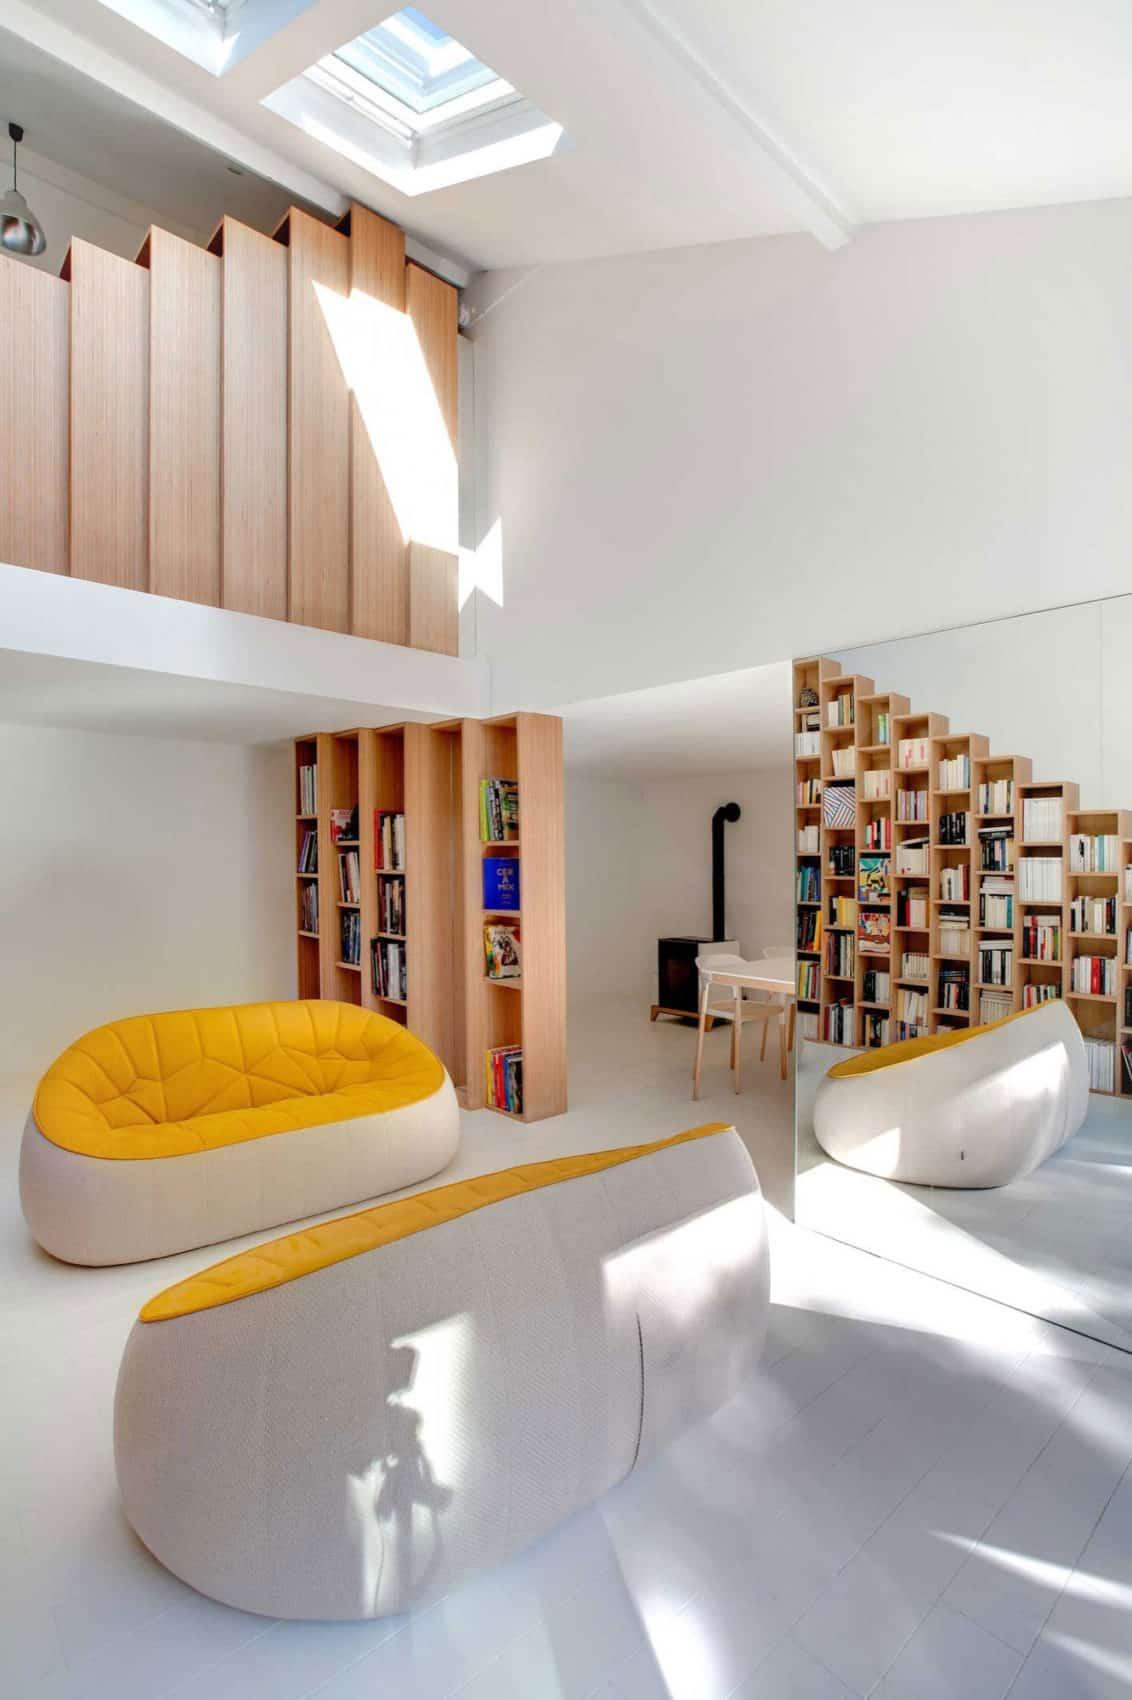 Bookshelf House by Andrea Mosca Creative Studio (4)